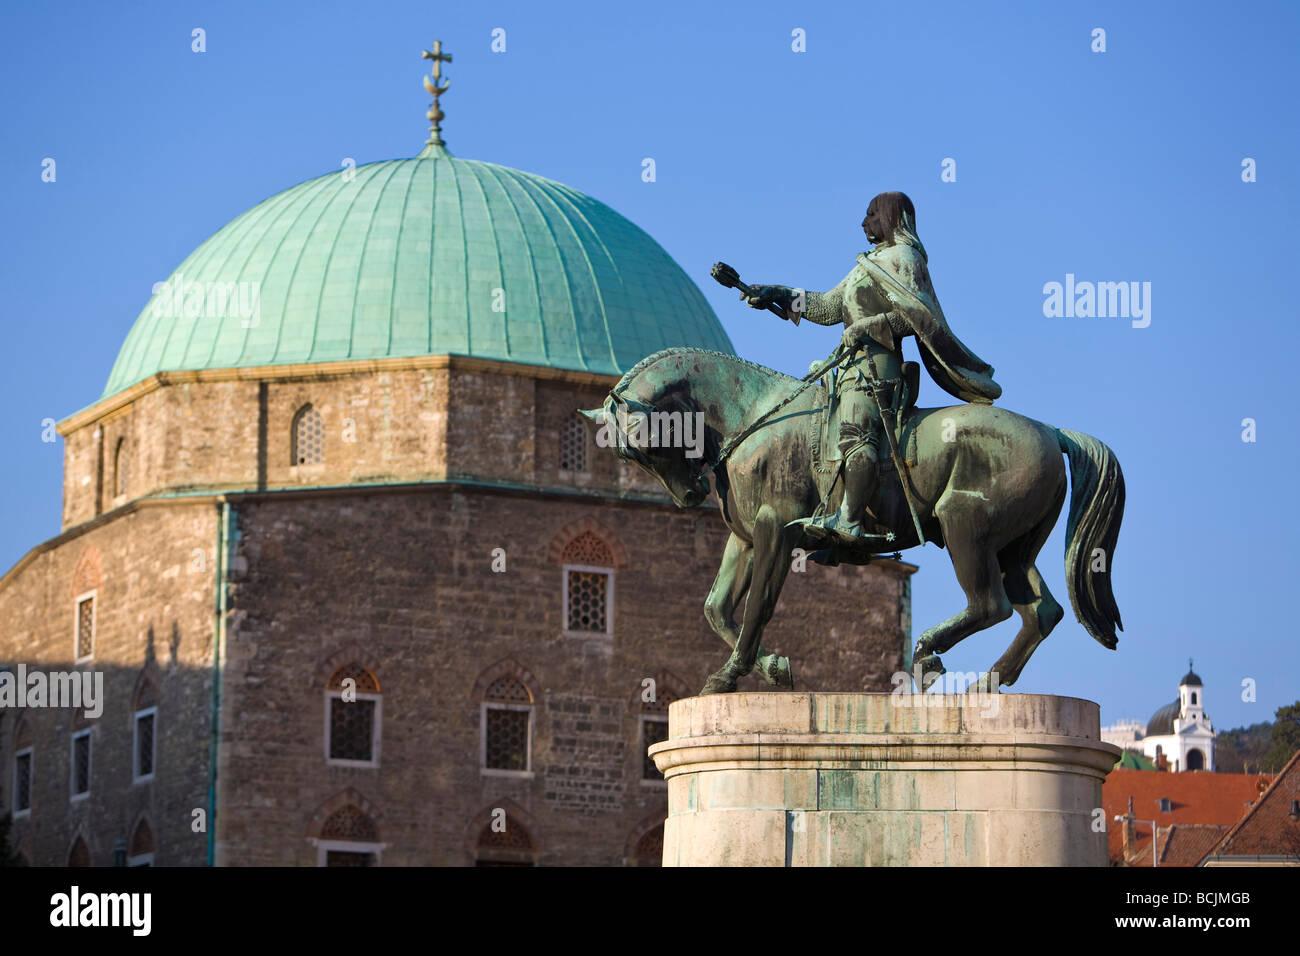 Laszlo Hunyadi Memorial & Dzsami (Turkish Church), Szechenyi Square, Pecs, Southern Transdanubia, Hungary, RF - Stock Image